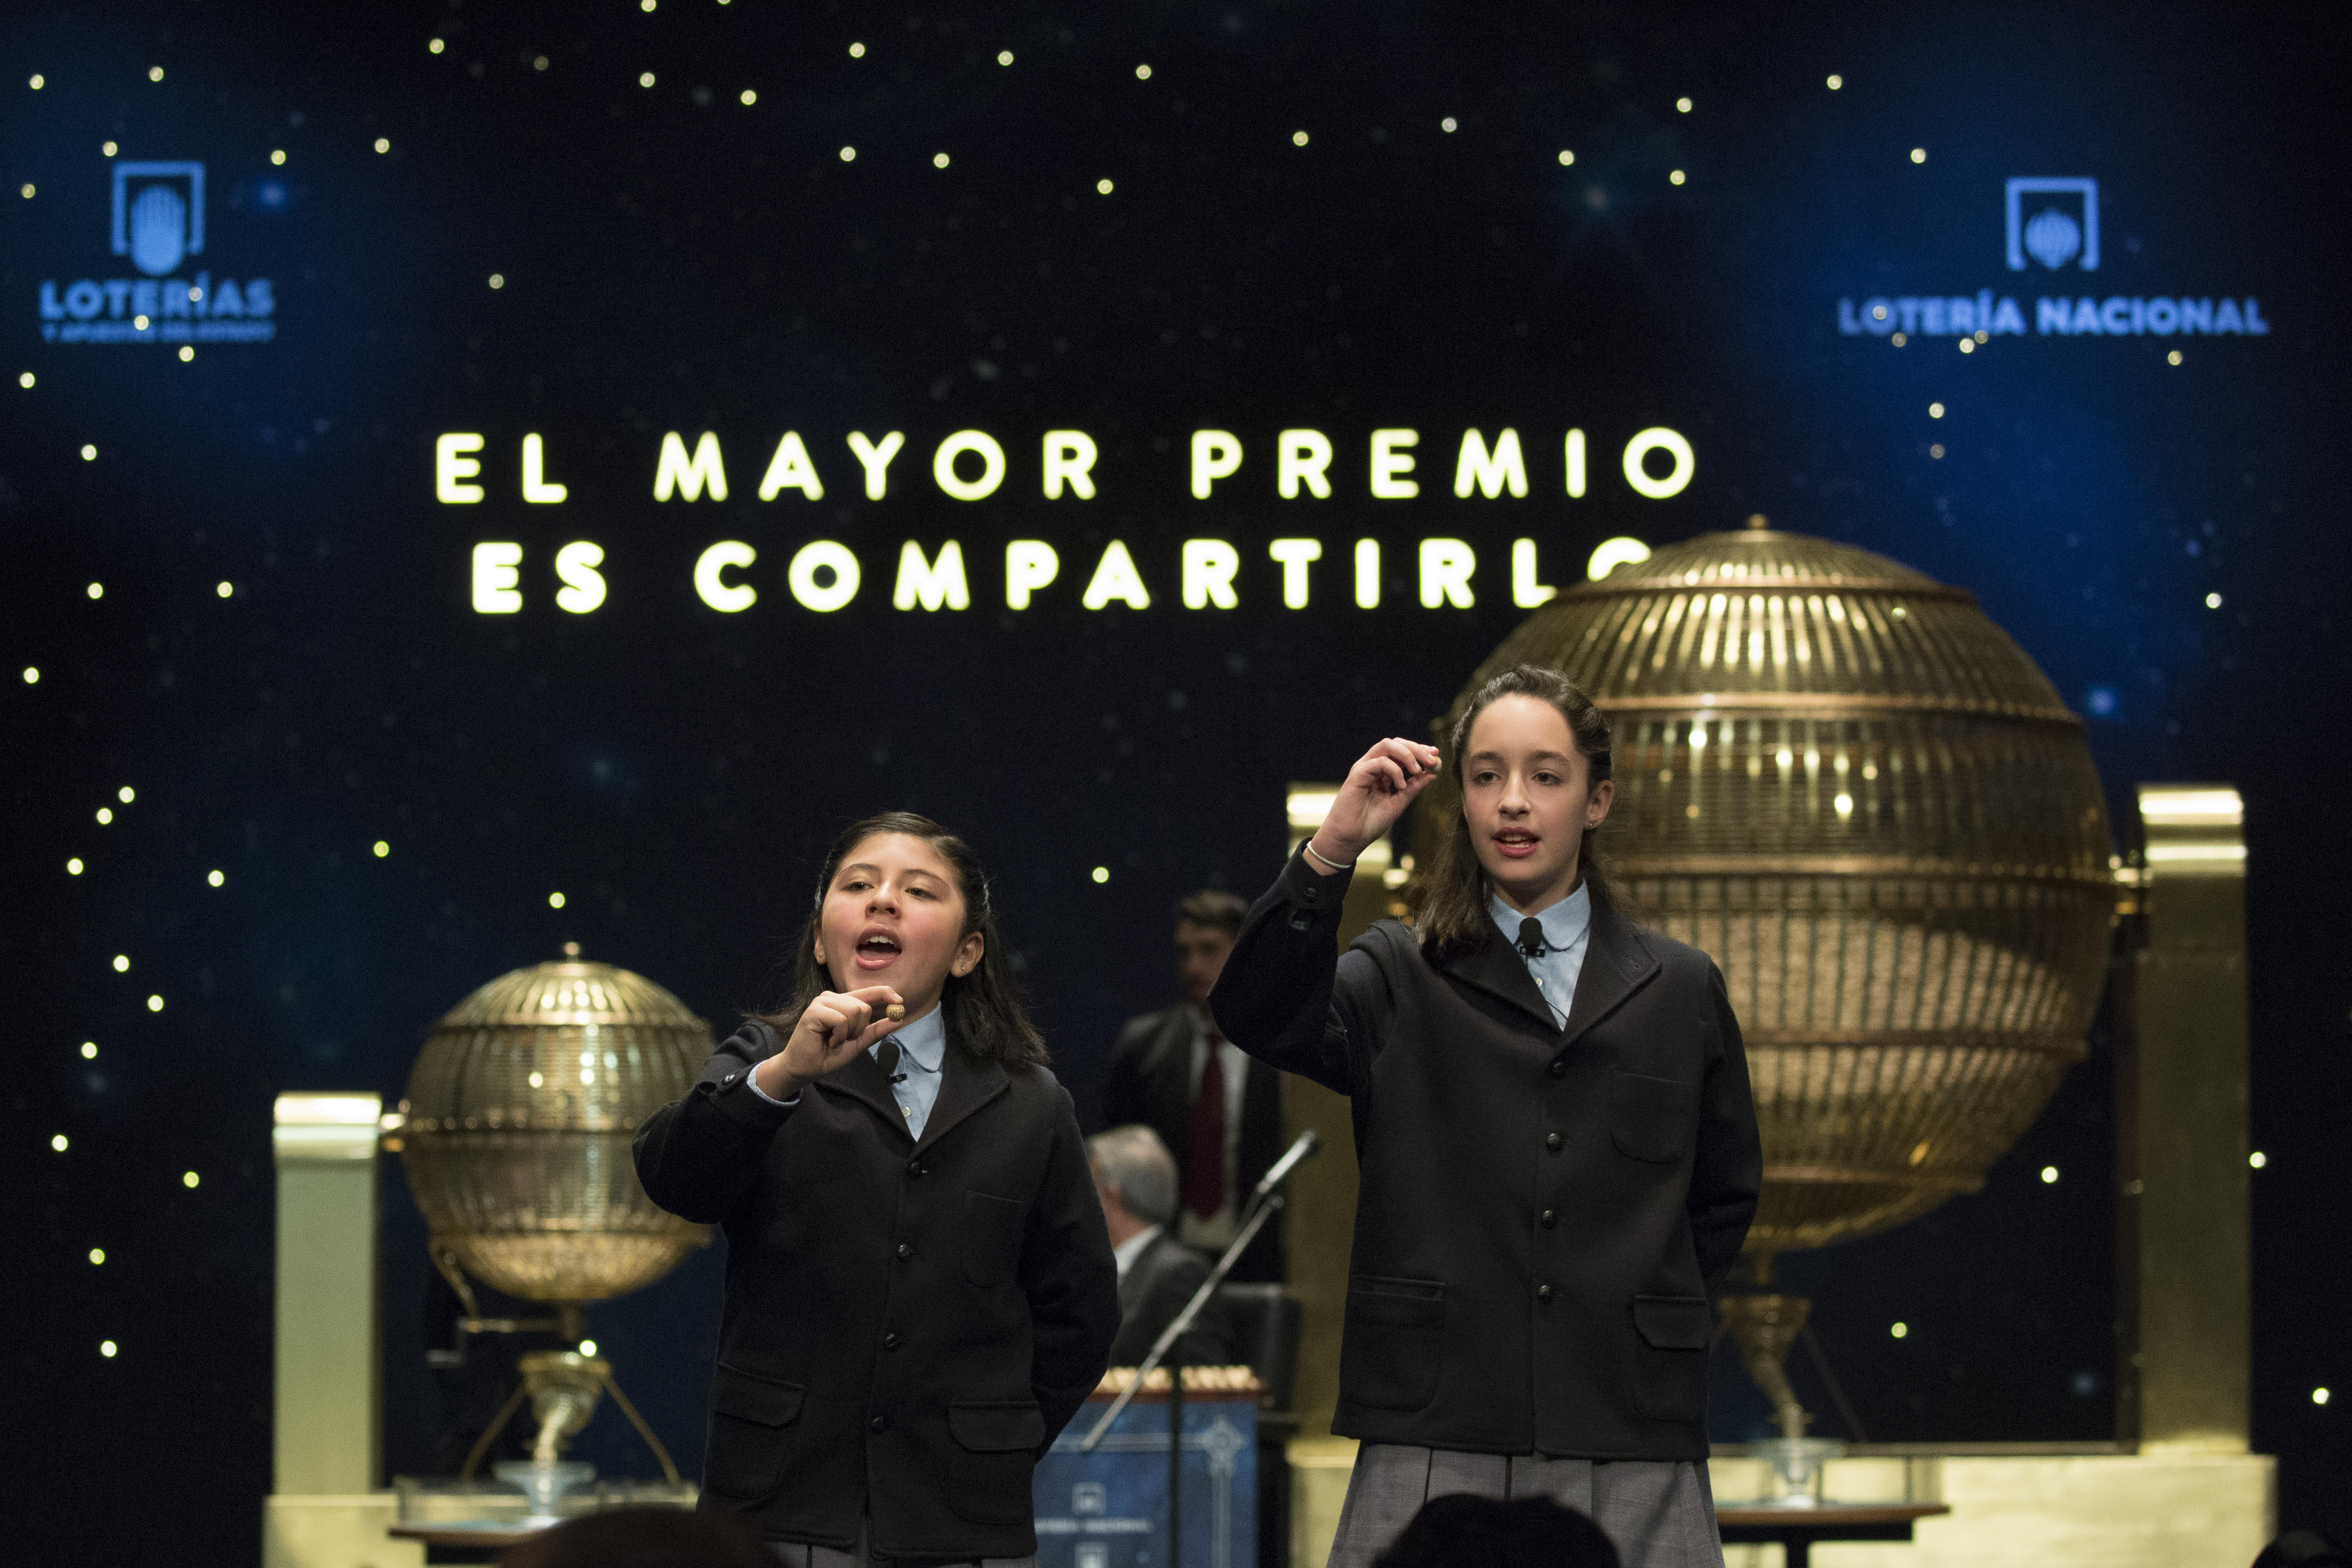 El Gordo Live Stream 2021